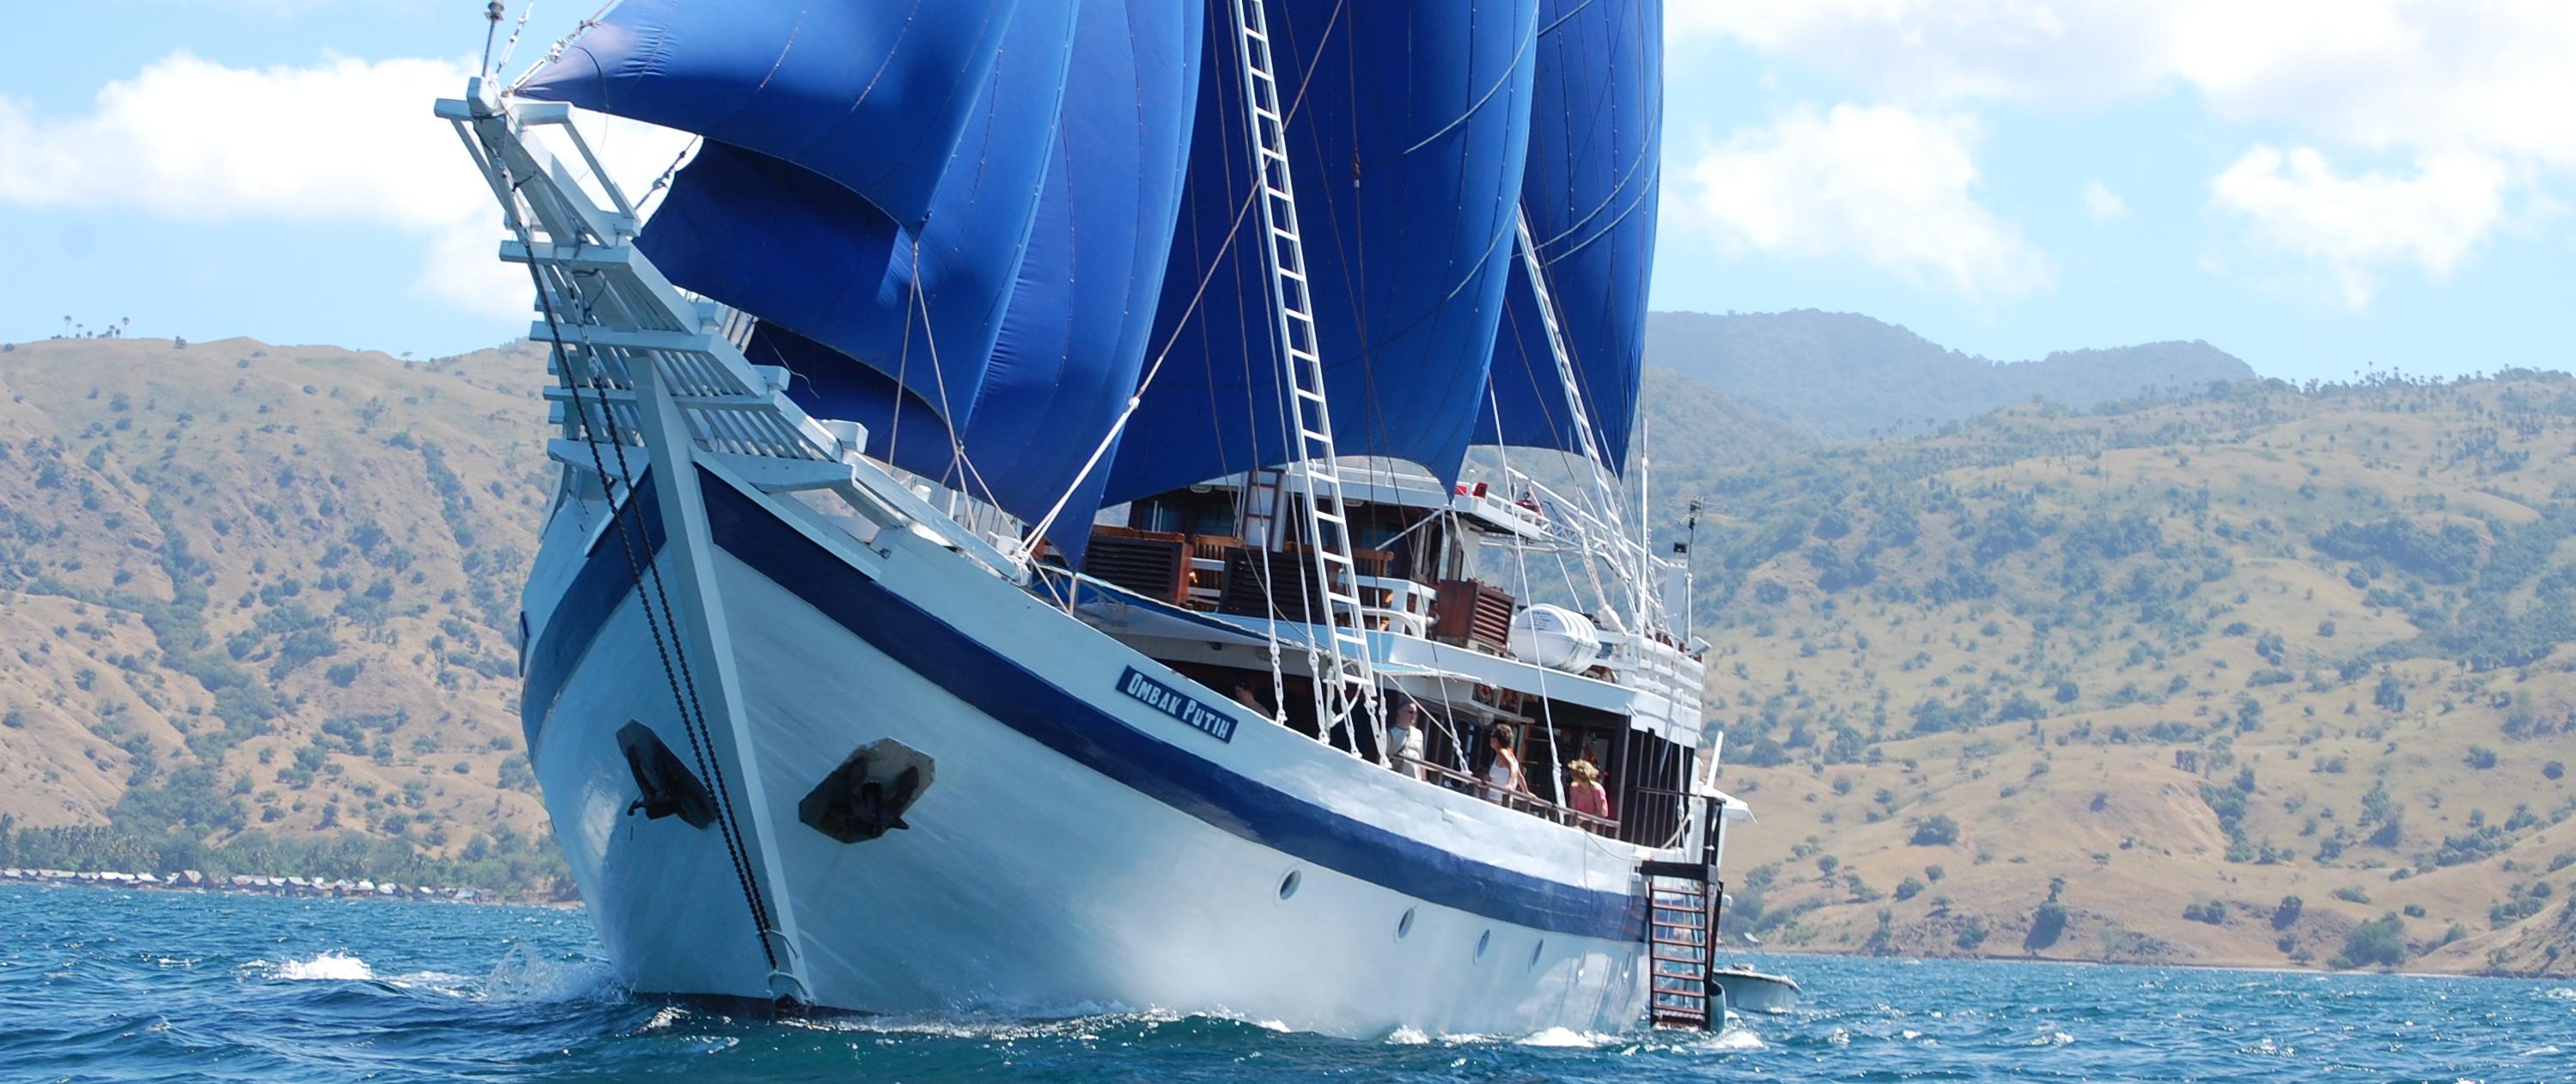 Bouwsteen Luxe cruise met Ombak Putih of Katharina